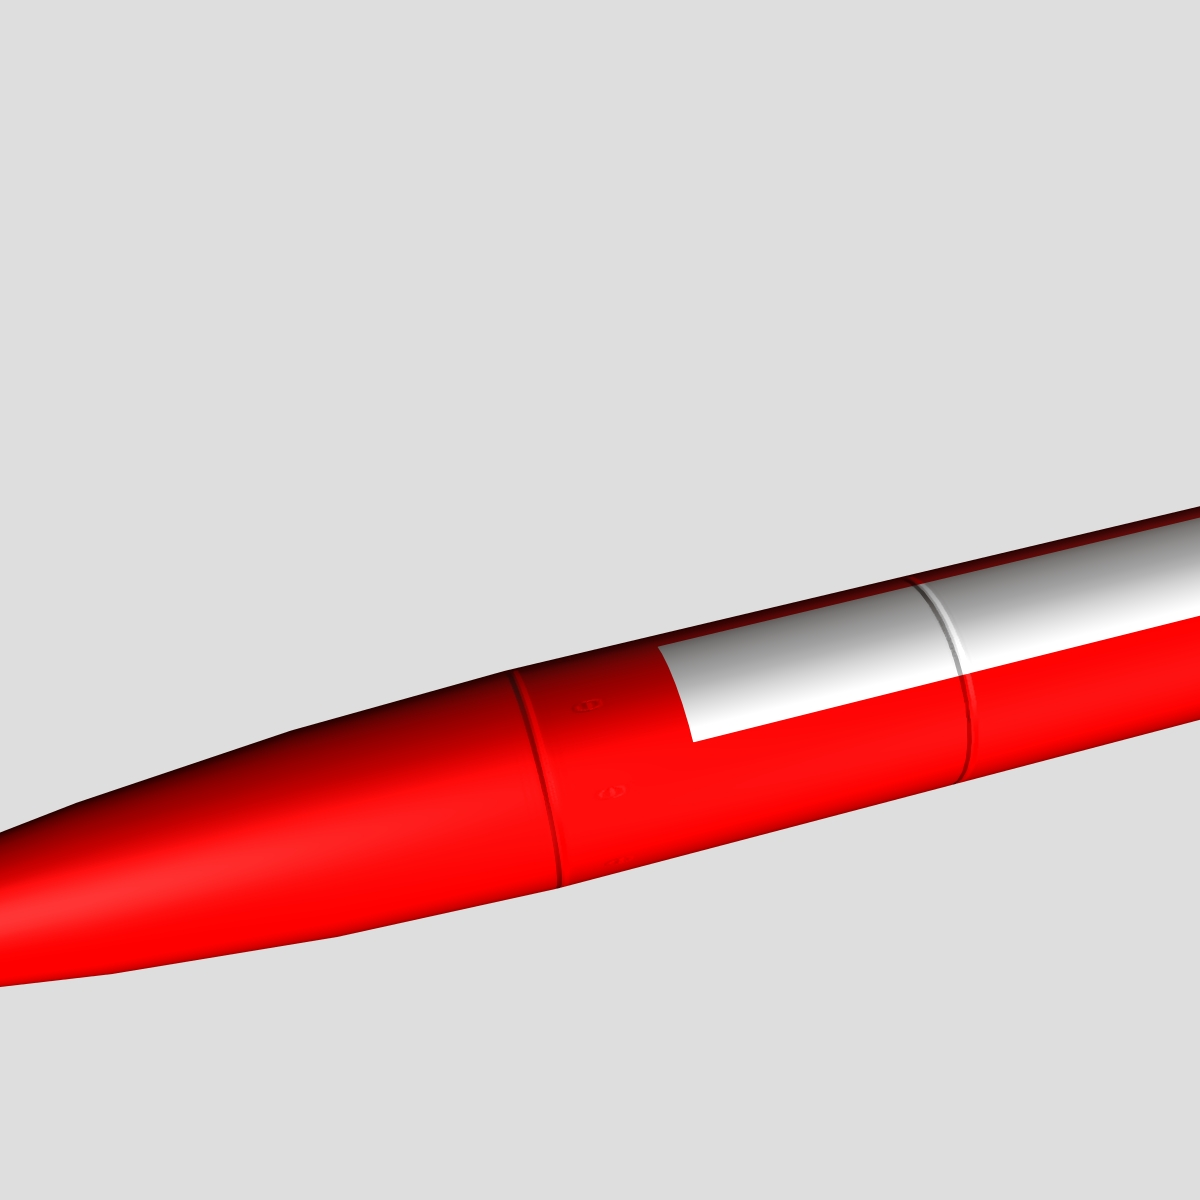 хар brant vi пуужин сонсогдож 3d загвар 3ds dxf cob x obj 150673